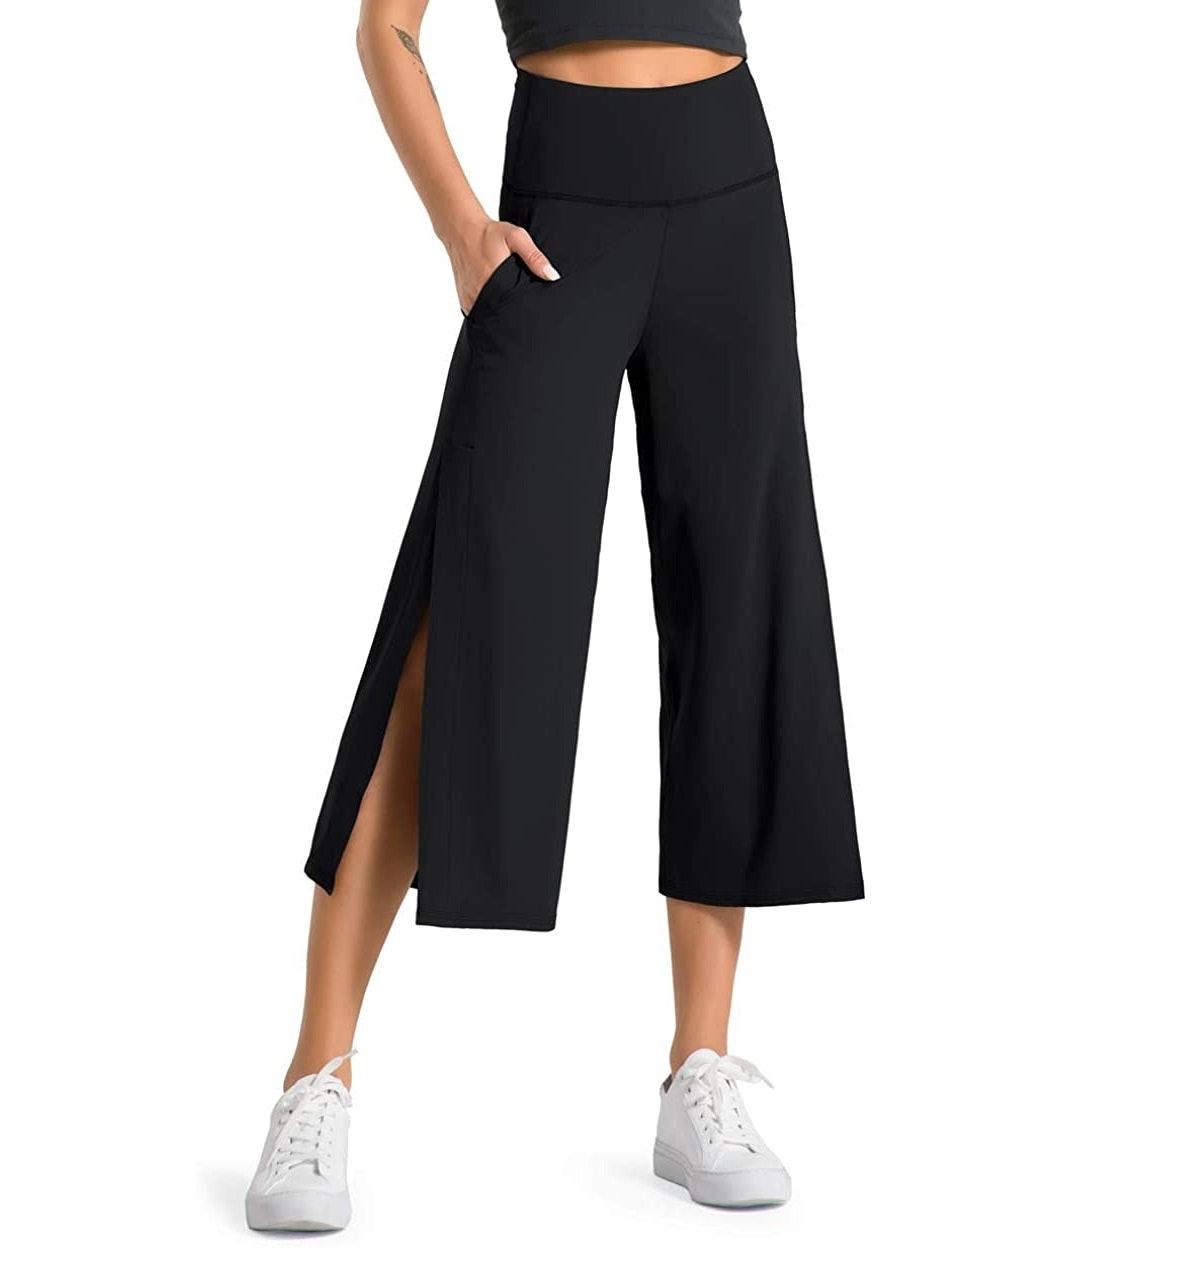 Dragon Fit Wide Bootleg Yoga Pants